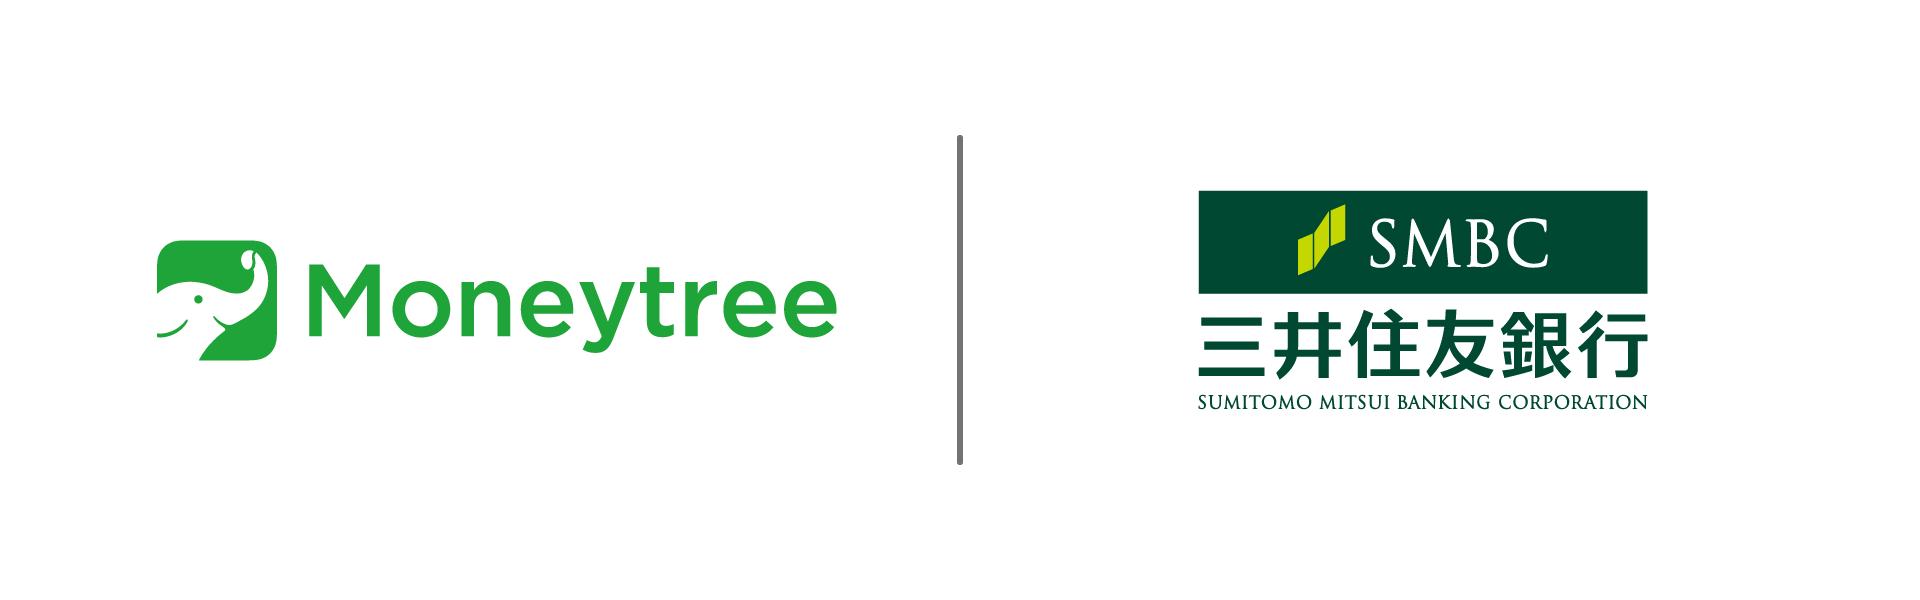 PressRelease SMBC Logo